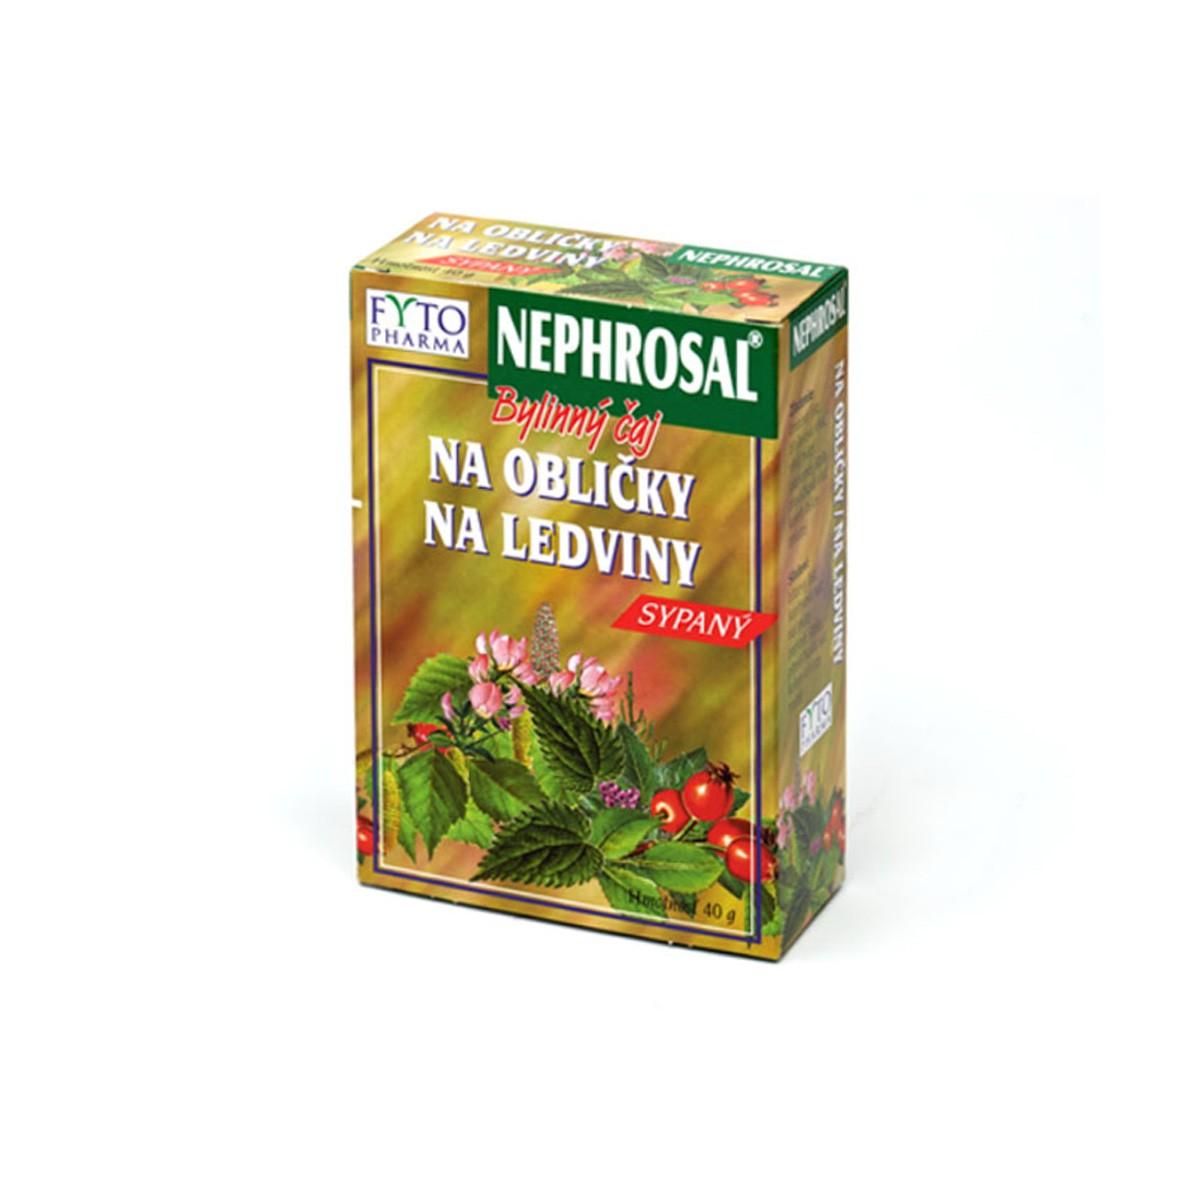 Nephrosal Bylin. �aj na ledviny 40g Fytopharma